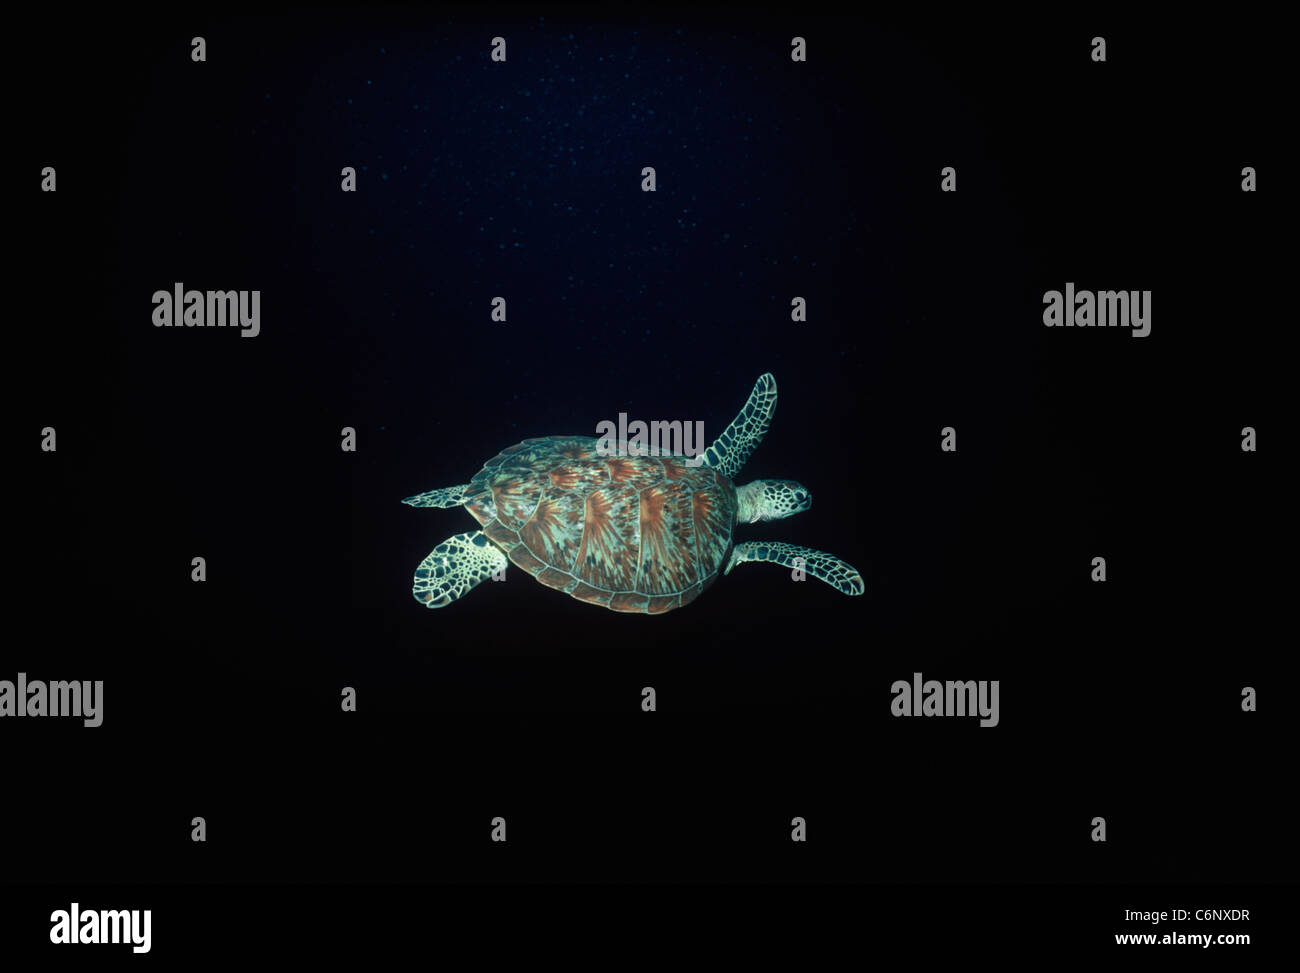 Hawksbill Turtle (Eretmochelys imbricata) swimming in the open ocean at night. Sipadan Island, Borneo, South China - Stock Image